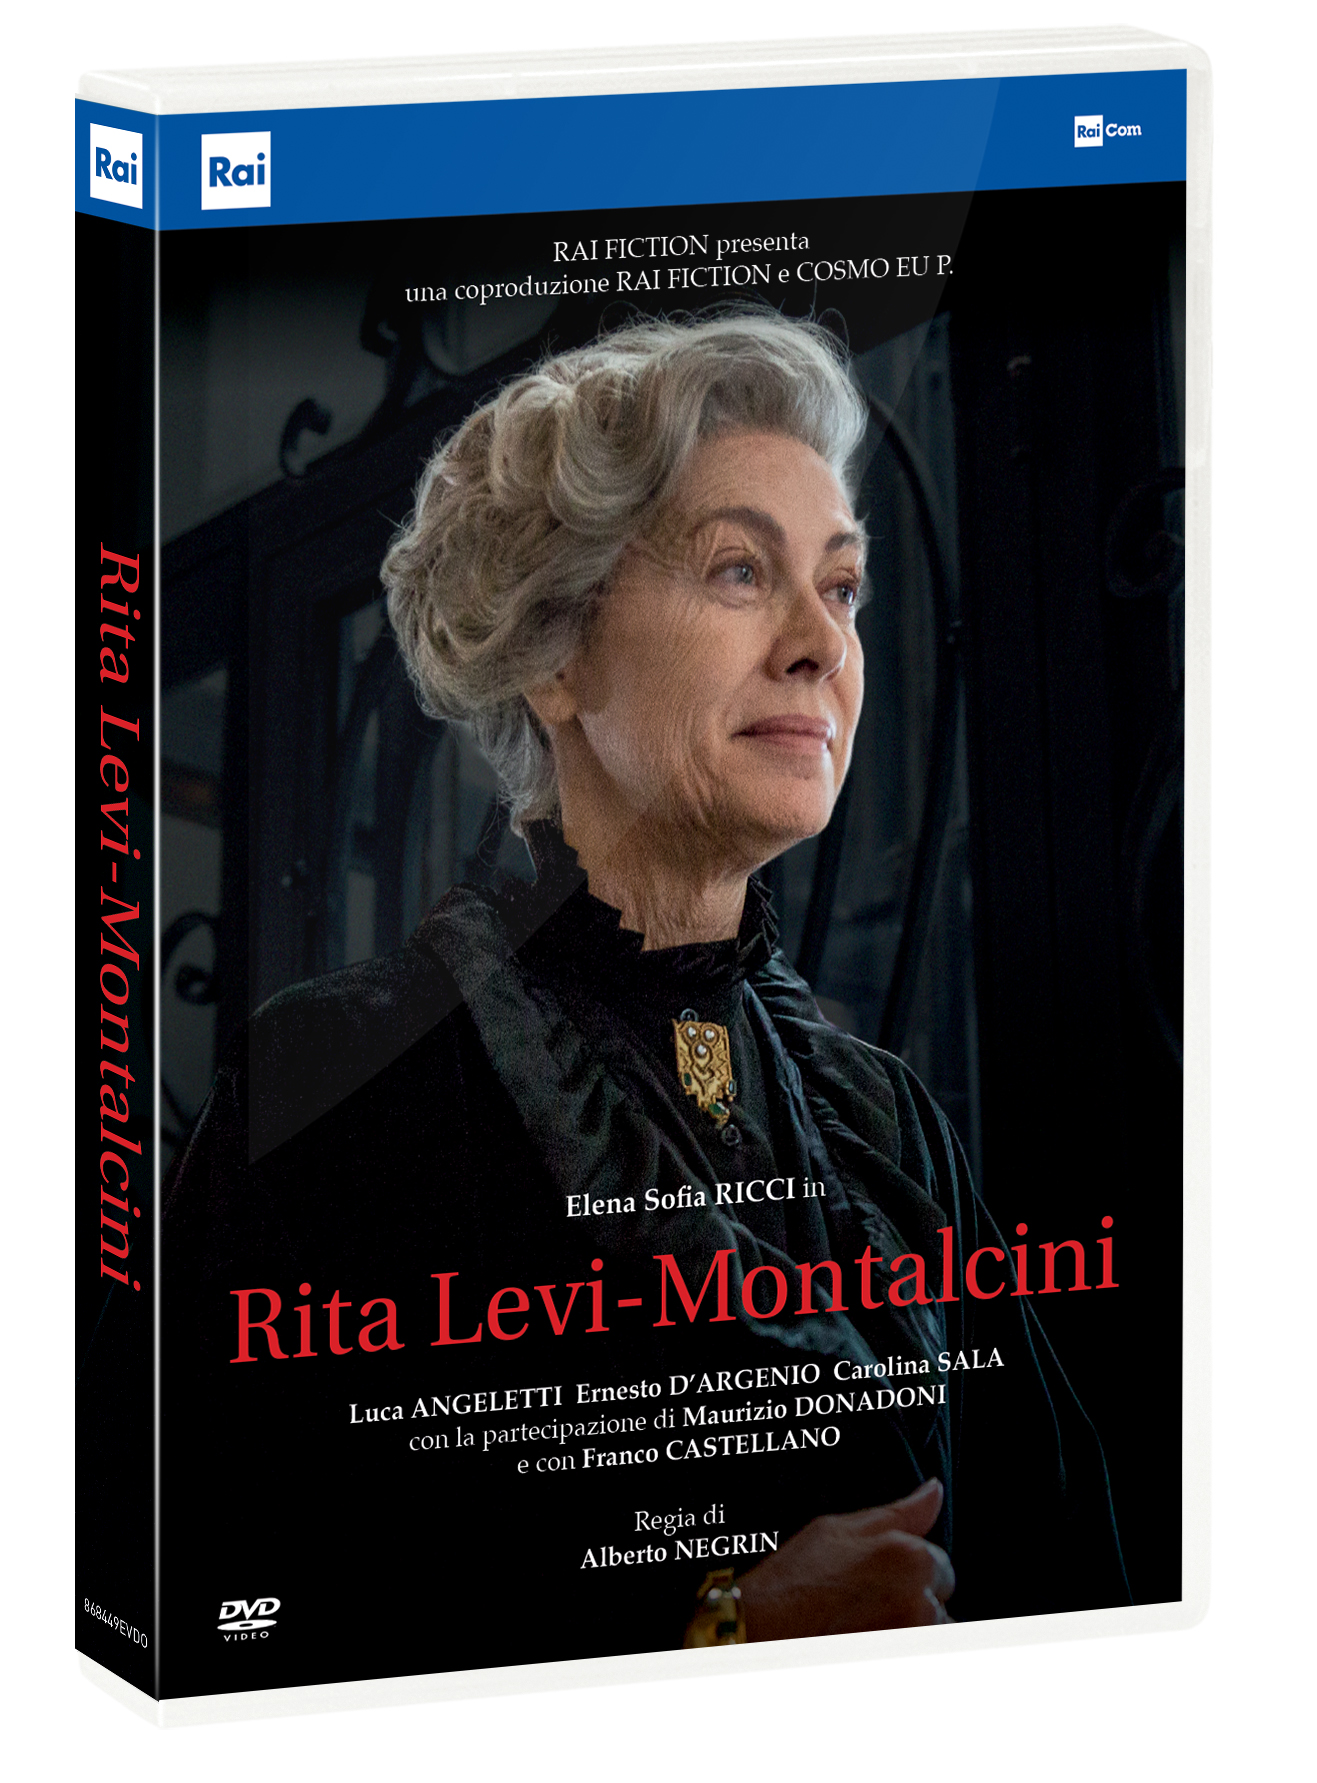 RITA LEVI MONTALCINI (DVD)